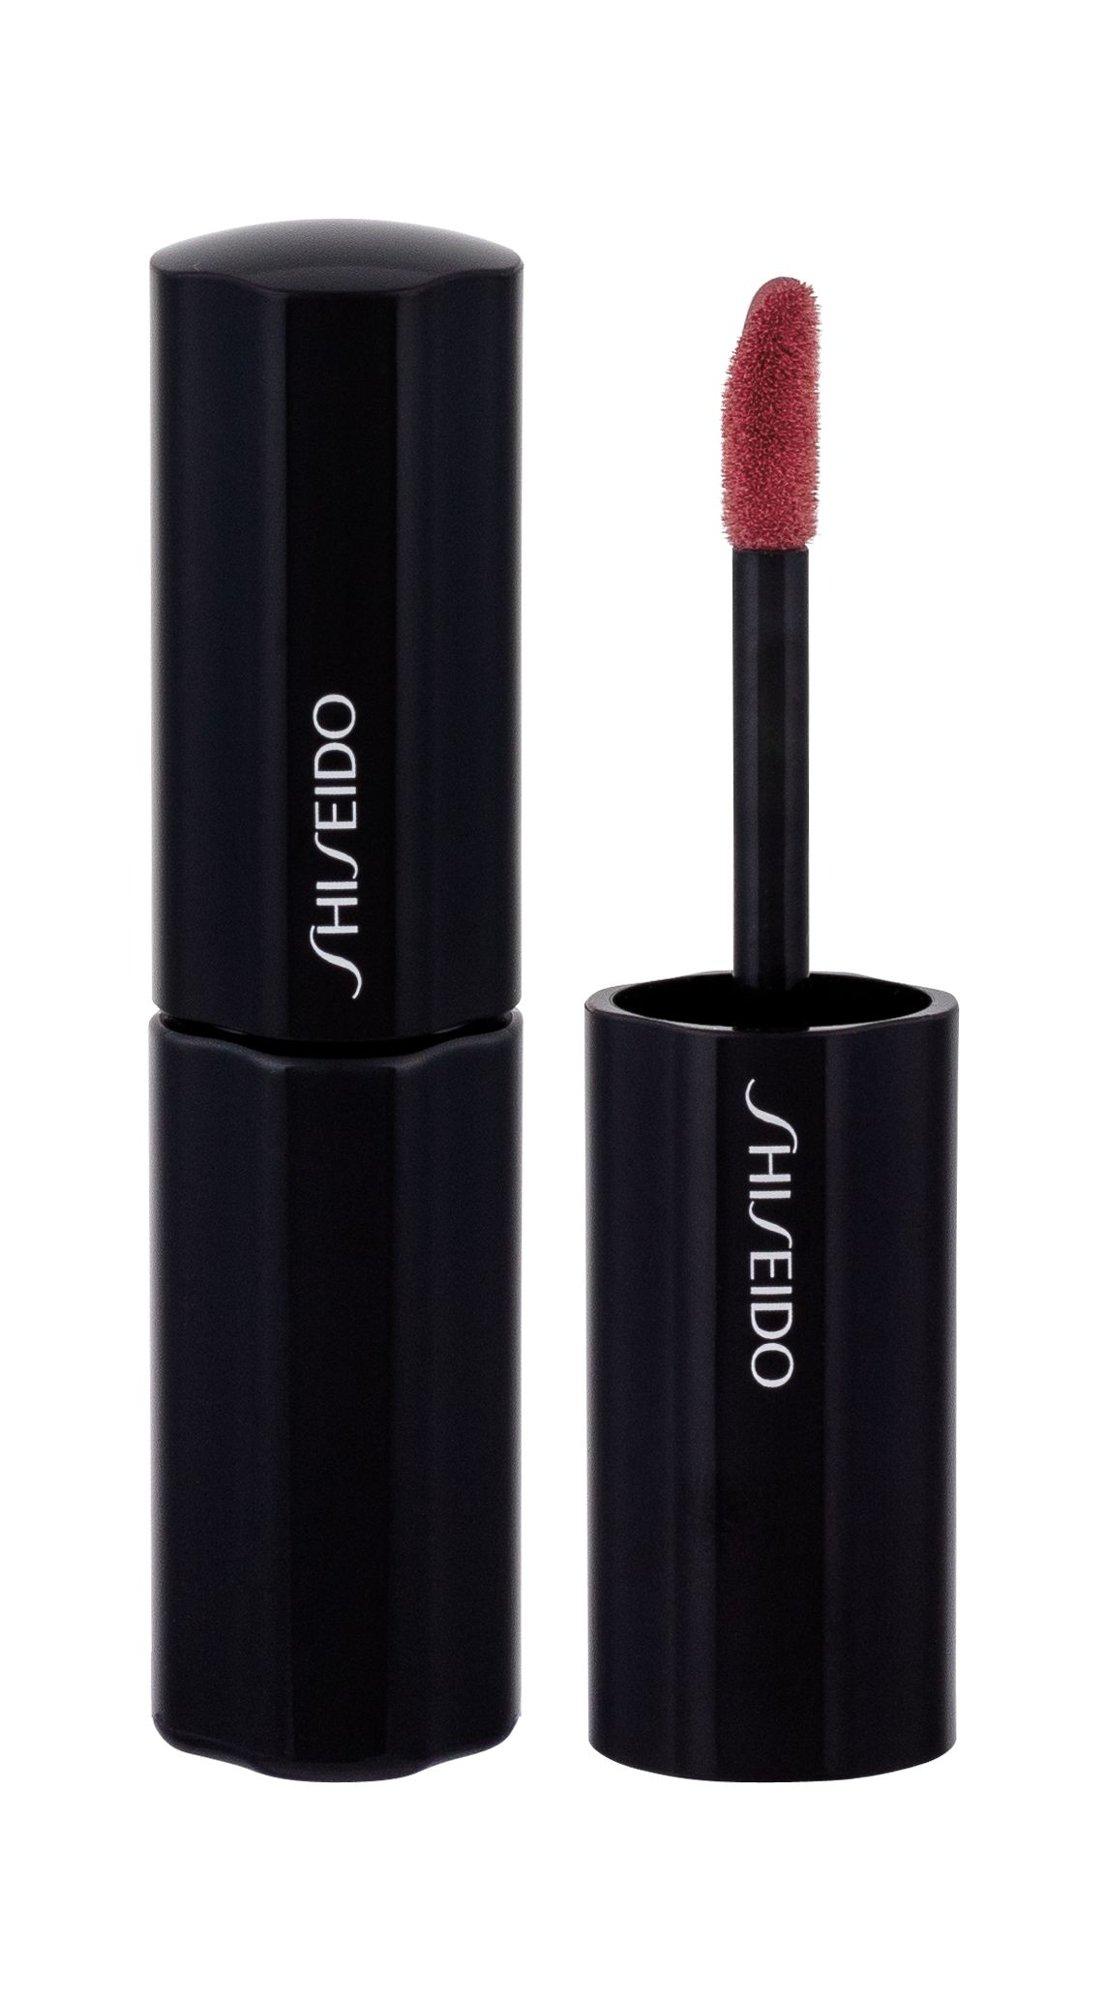 Shiseido Lacquer Rouge Lipstick 6ml RD321